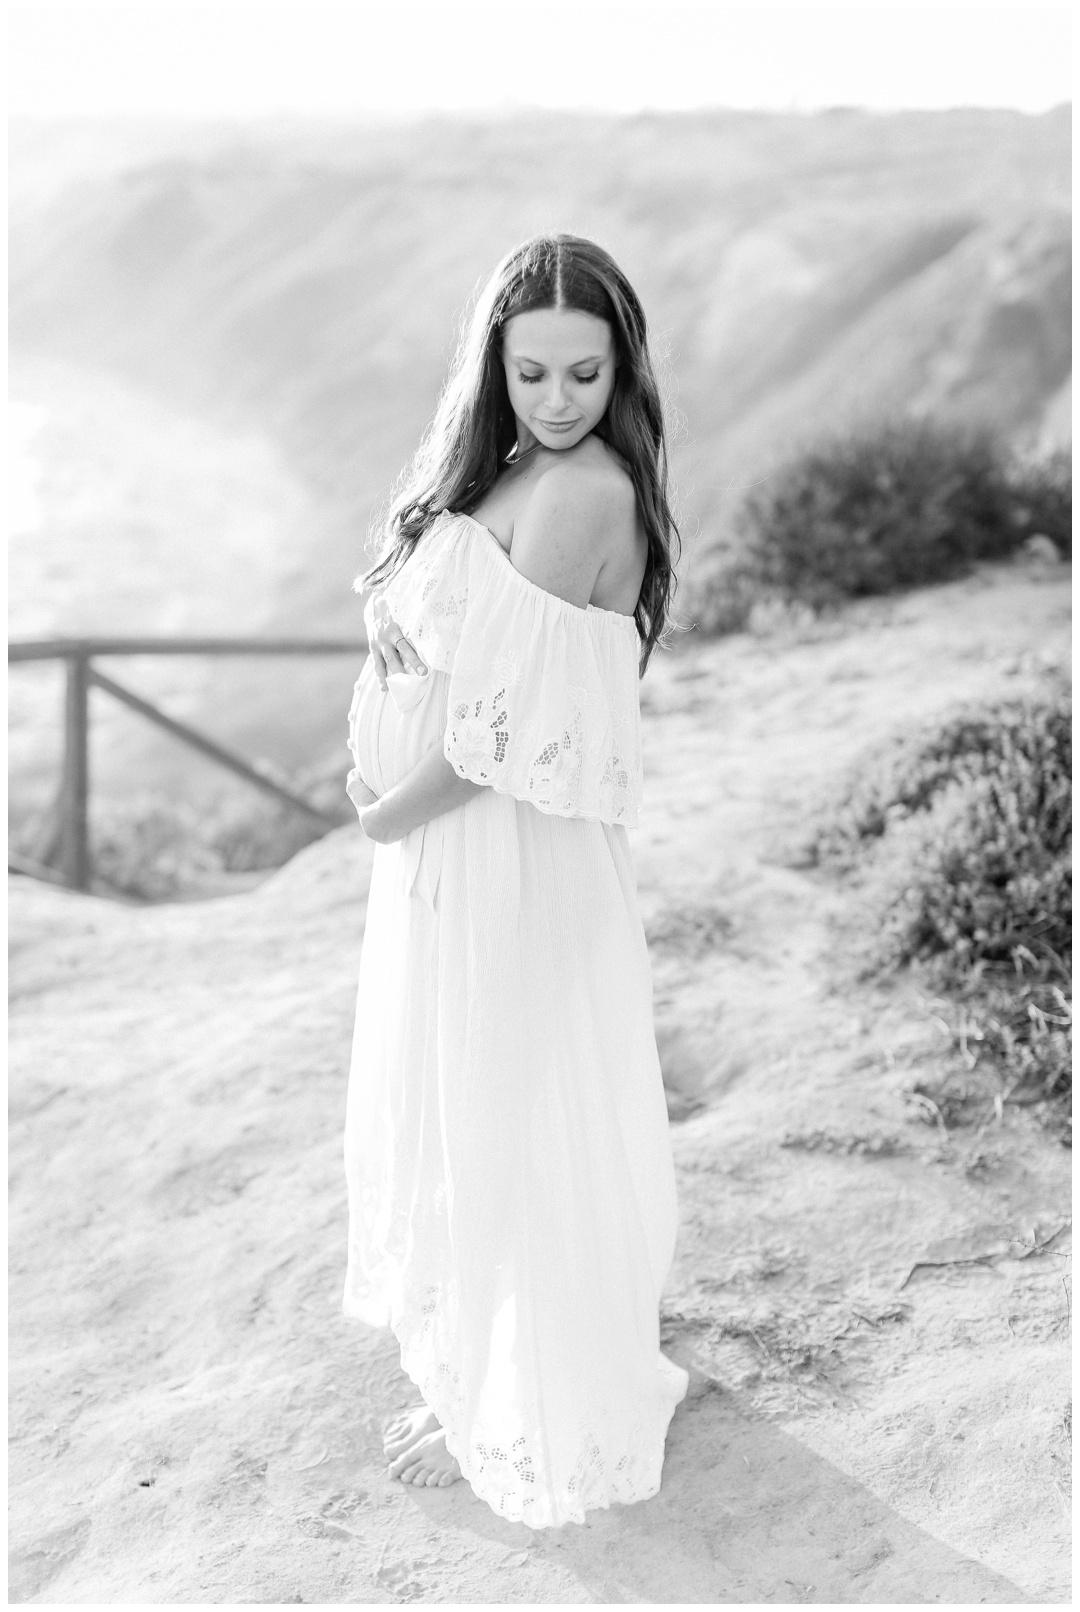 Newport_Beach_Maternity_Photographer_Beach_Maternity_Photography_Cori_Kleckner_Photography_0999.jpg